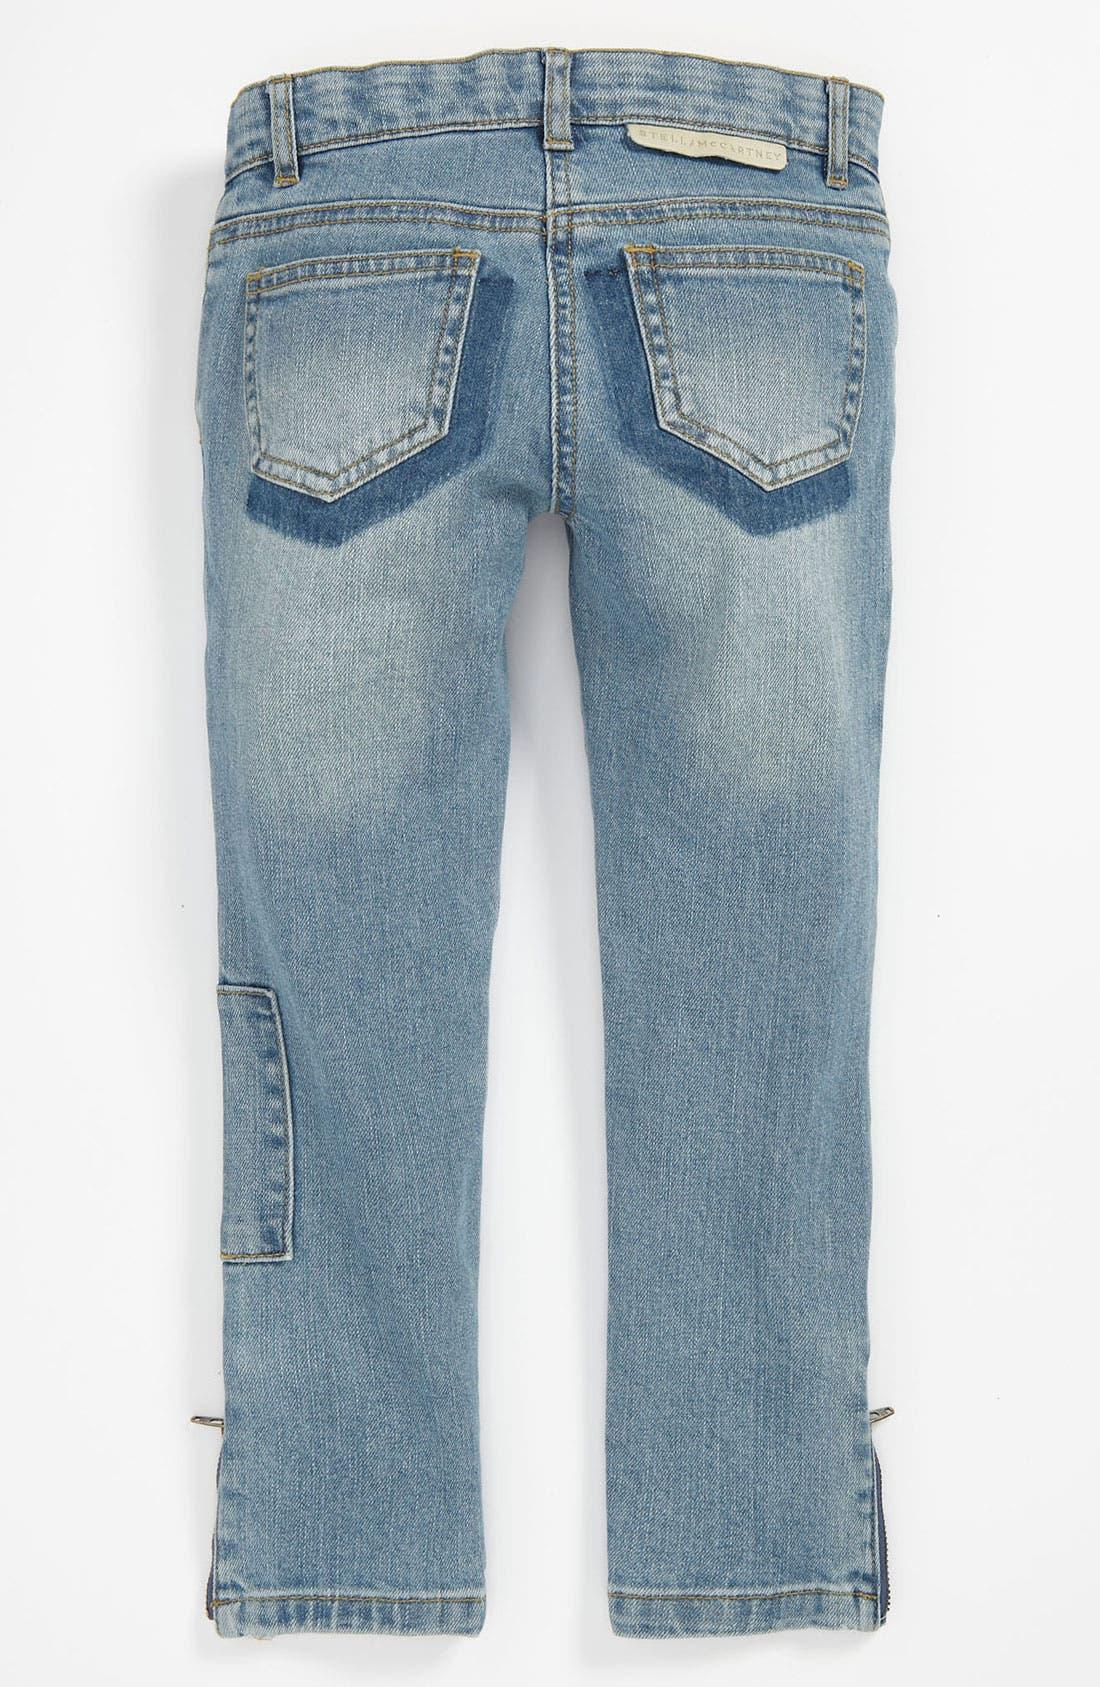 Main Image - Stella McCartney Kids 'Nina' Skinny Jeans (Toddler, Little Girls & Big Girls)